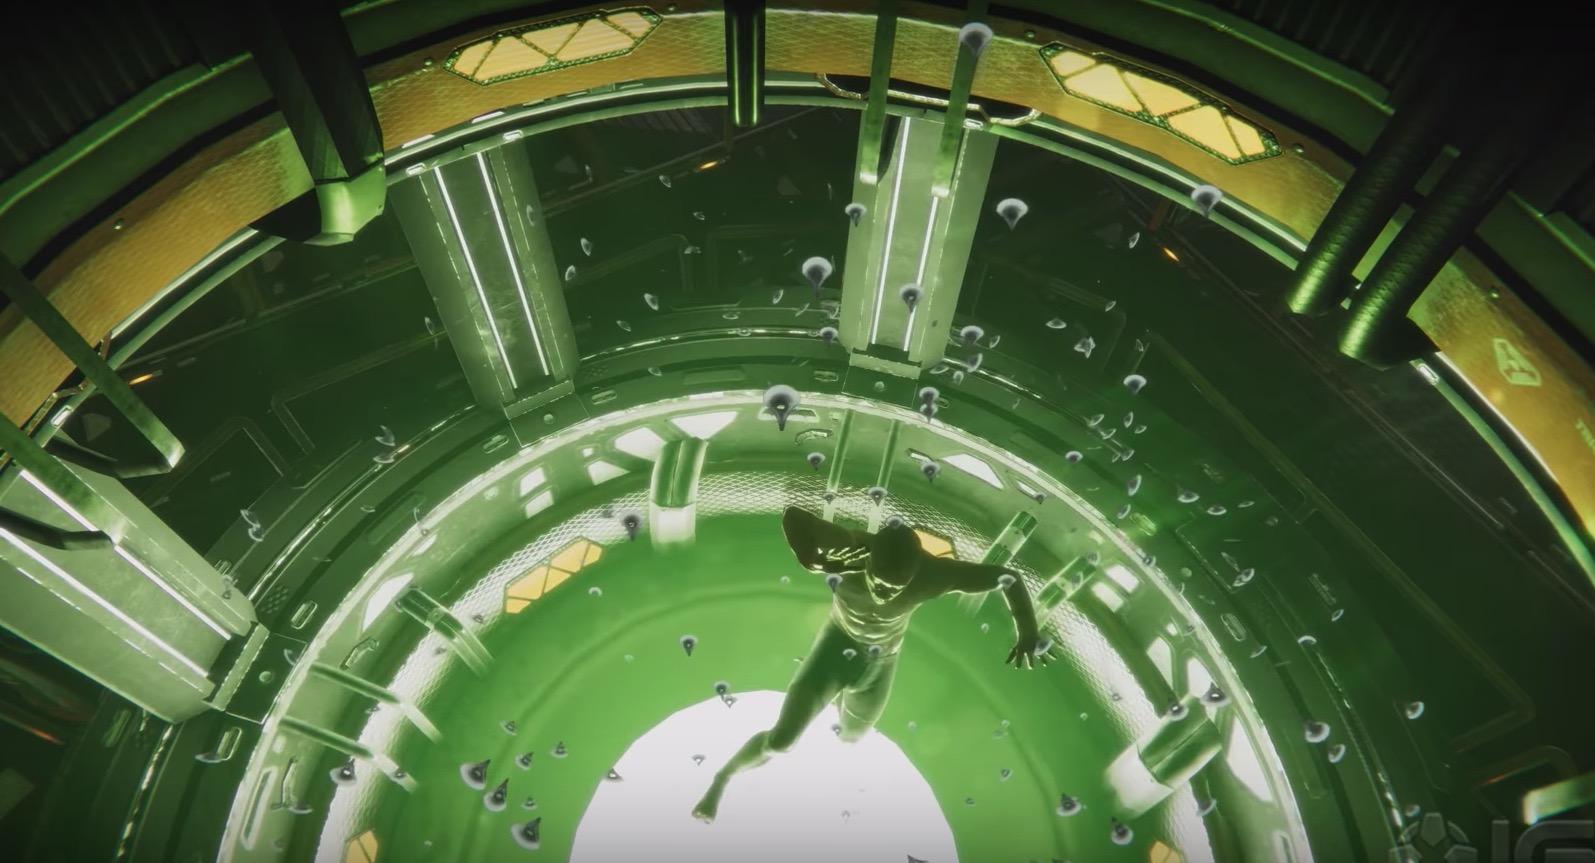 System Shock 3 gameplay trailer